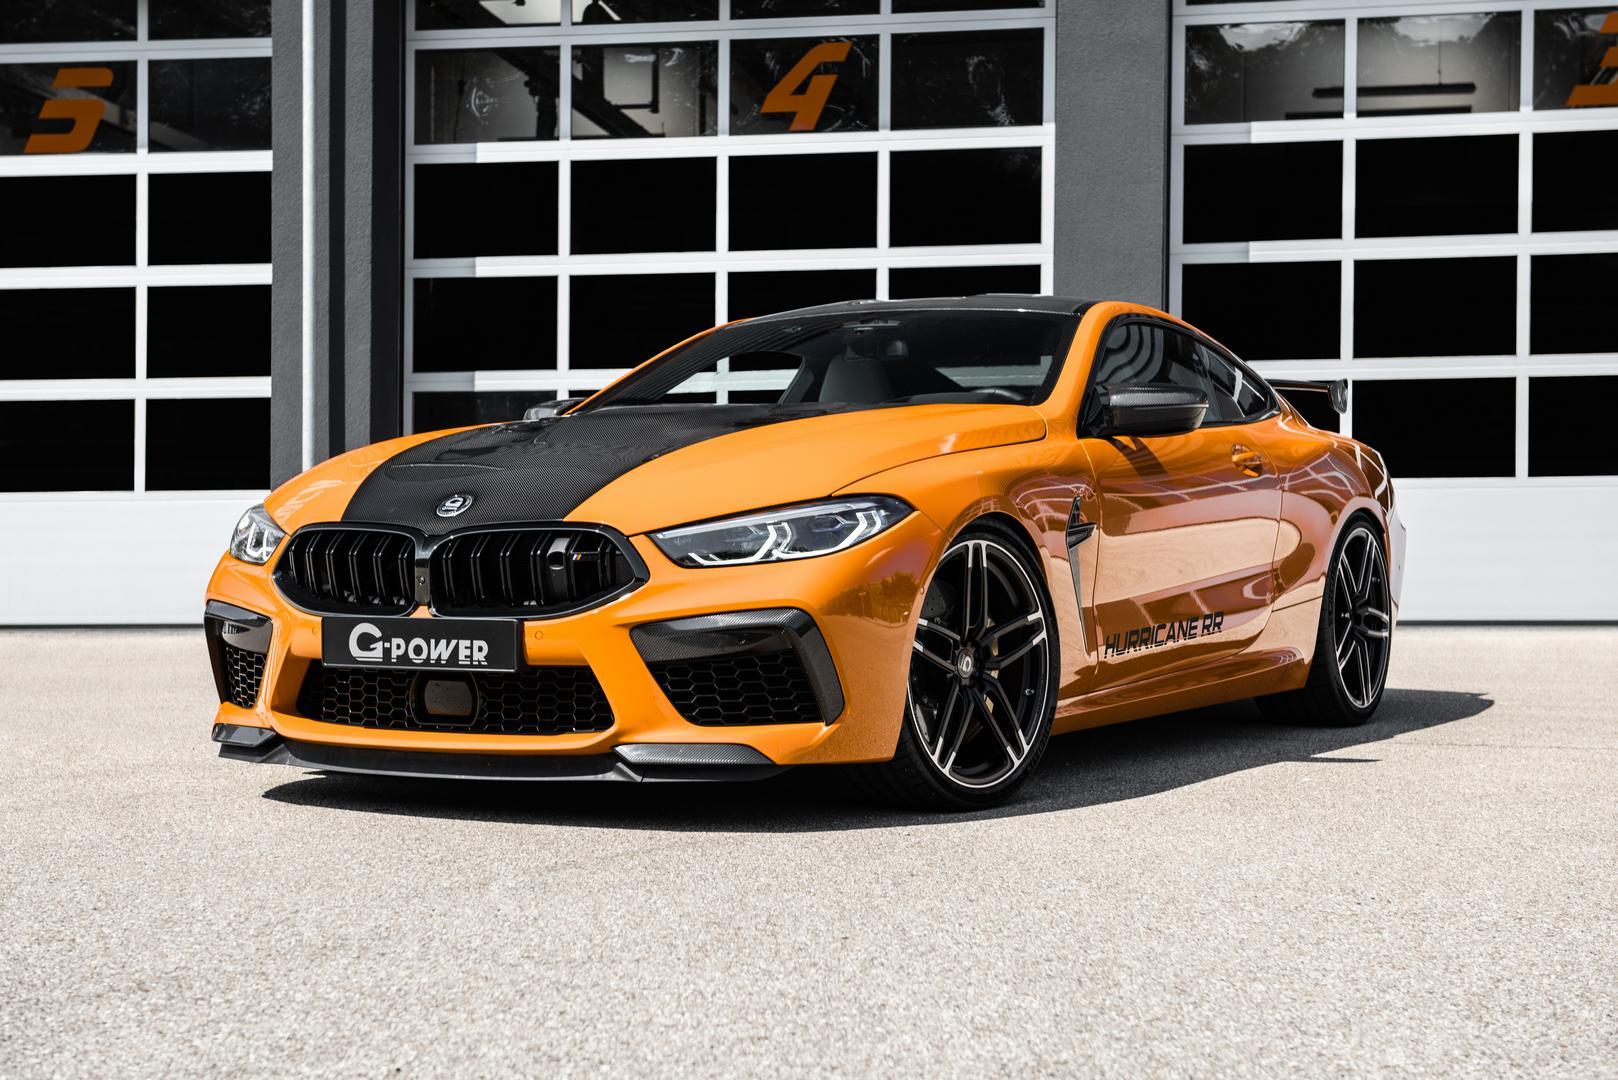 G-Power G8M Hurricane RR: The Fastest BMW M8